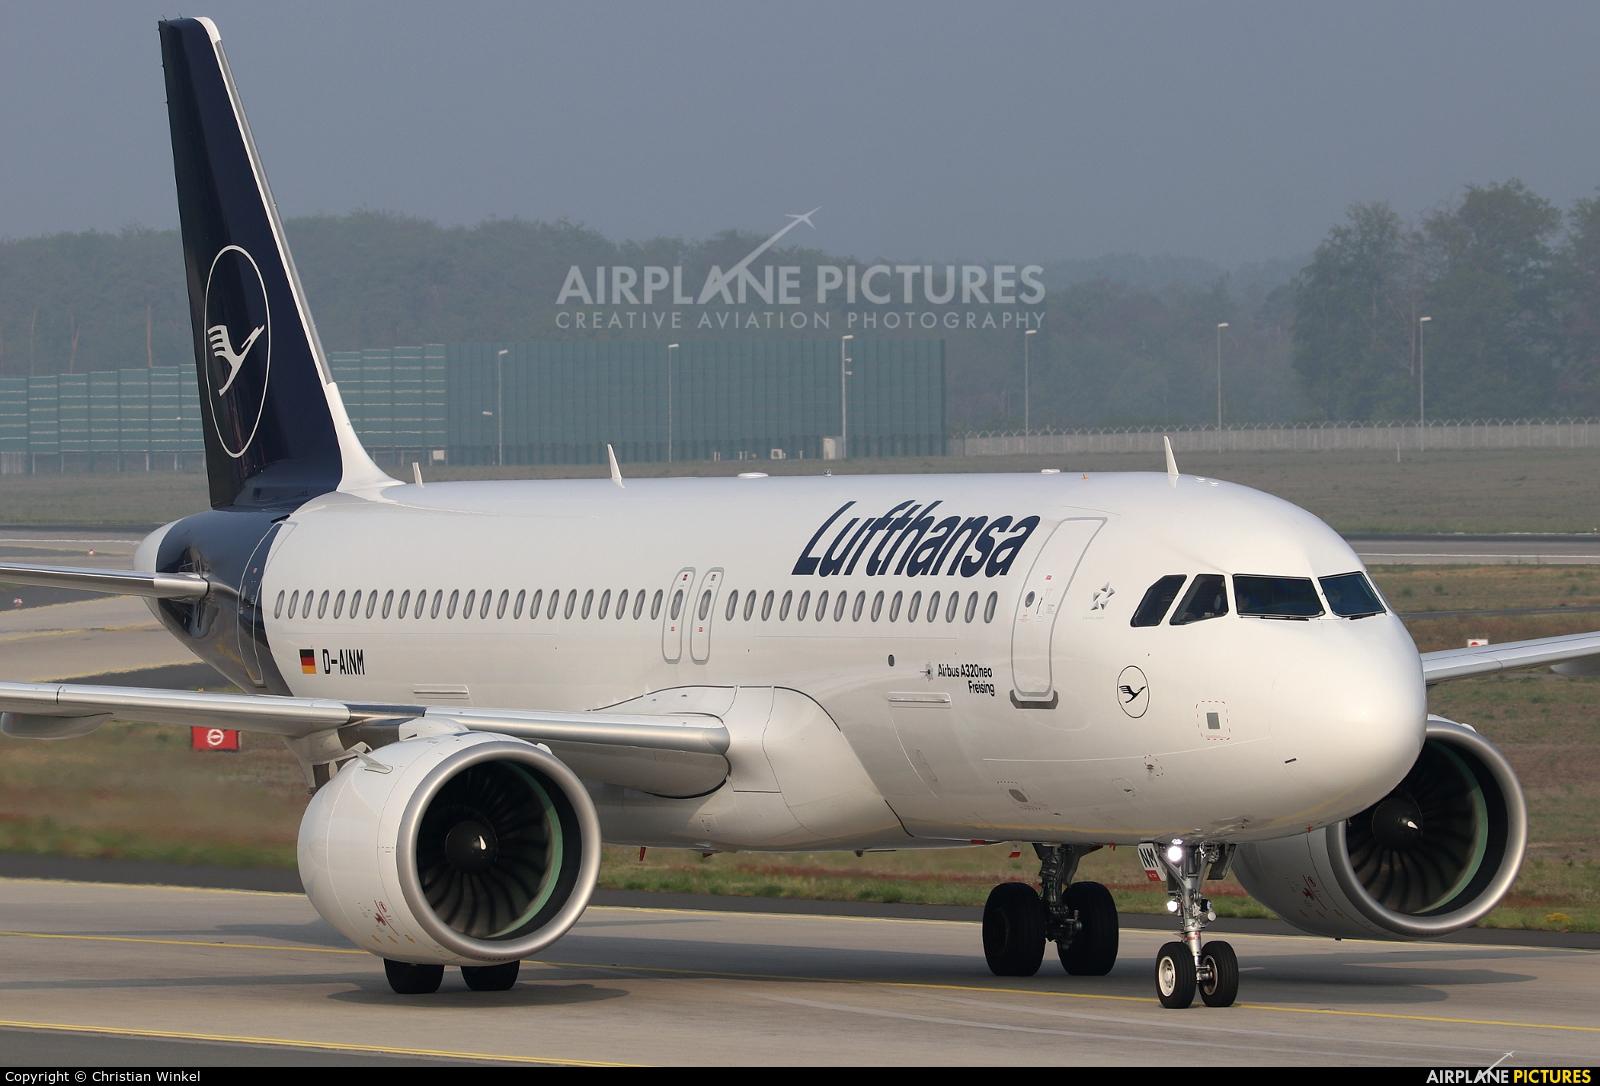 Lufthansa D-AINM aircraft at Frankfurt